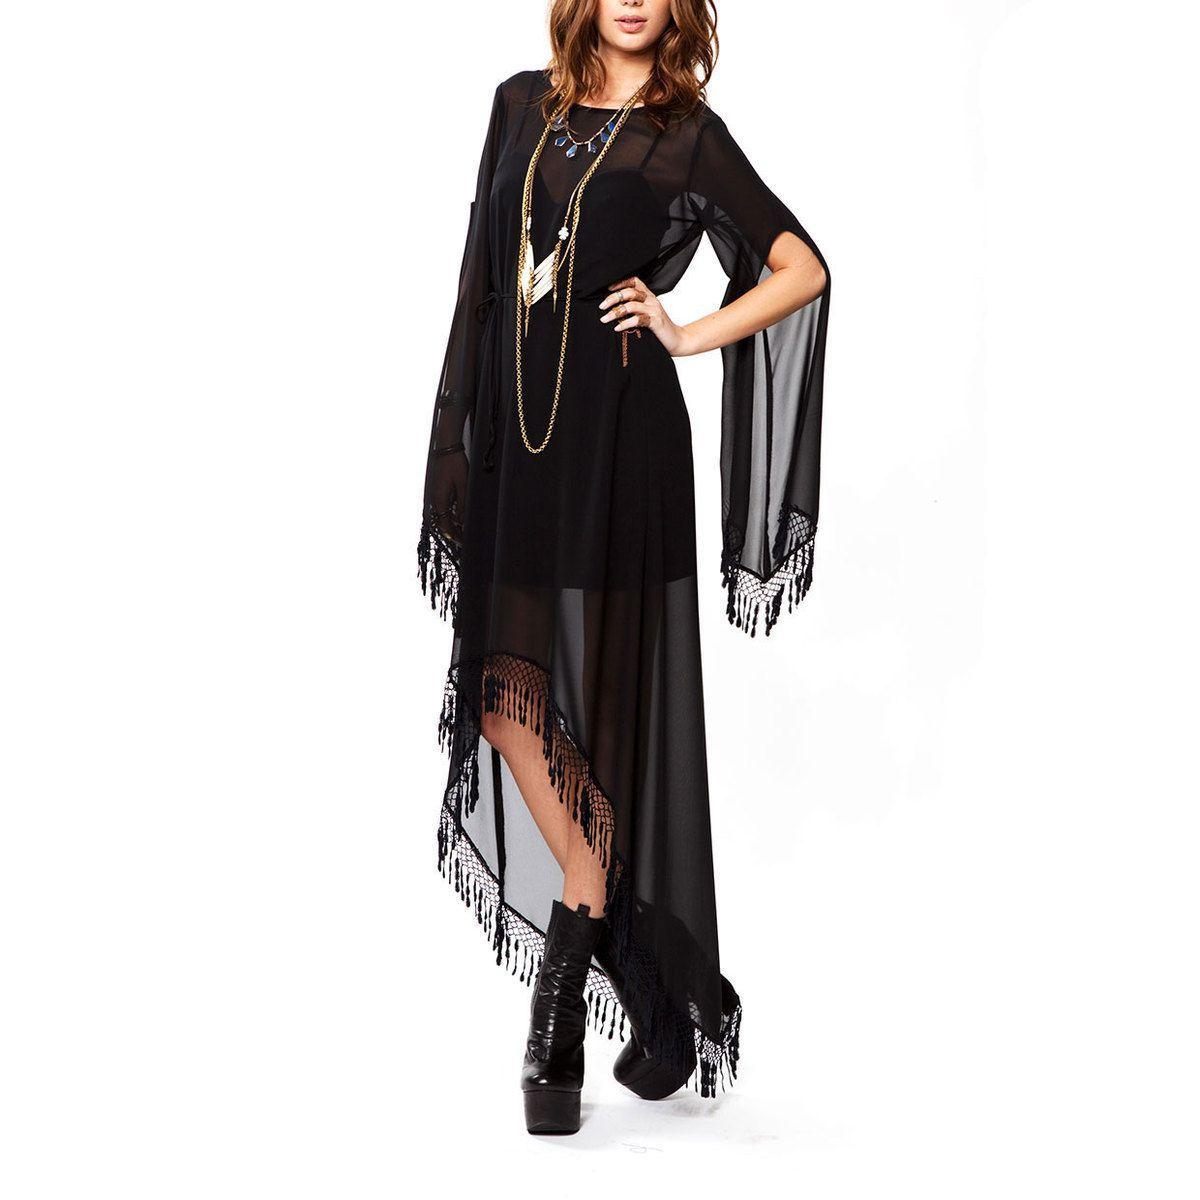 Stevie Nicks Love 11 Fab Com Wild Horses Dress Black Horse Dress Fashion Dresses [ 1200 x 1200 Pixel ]